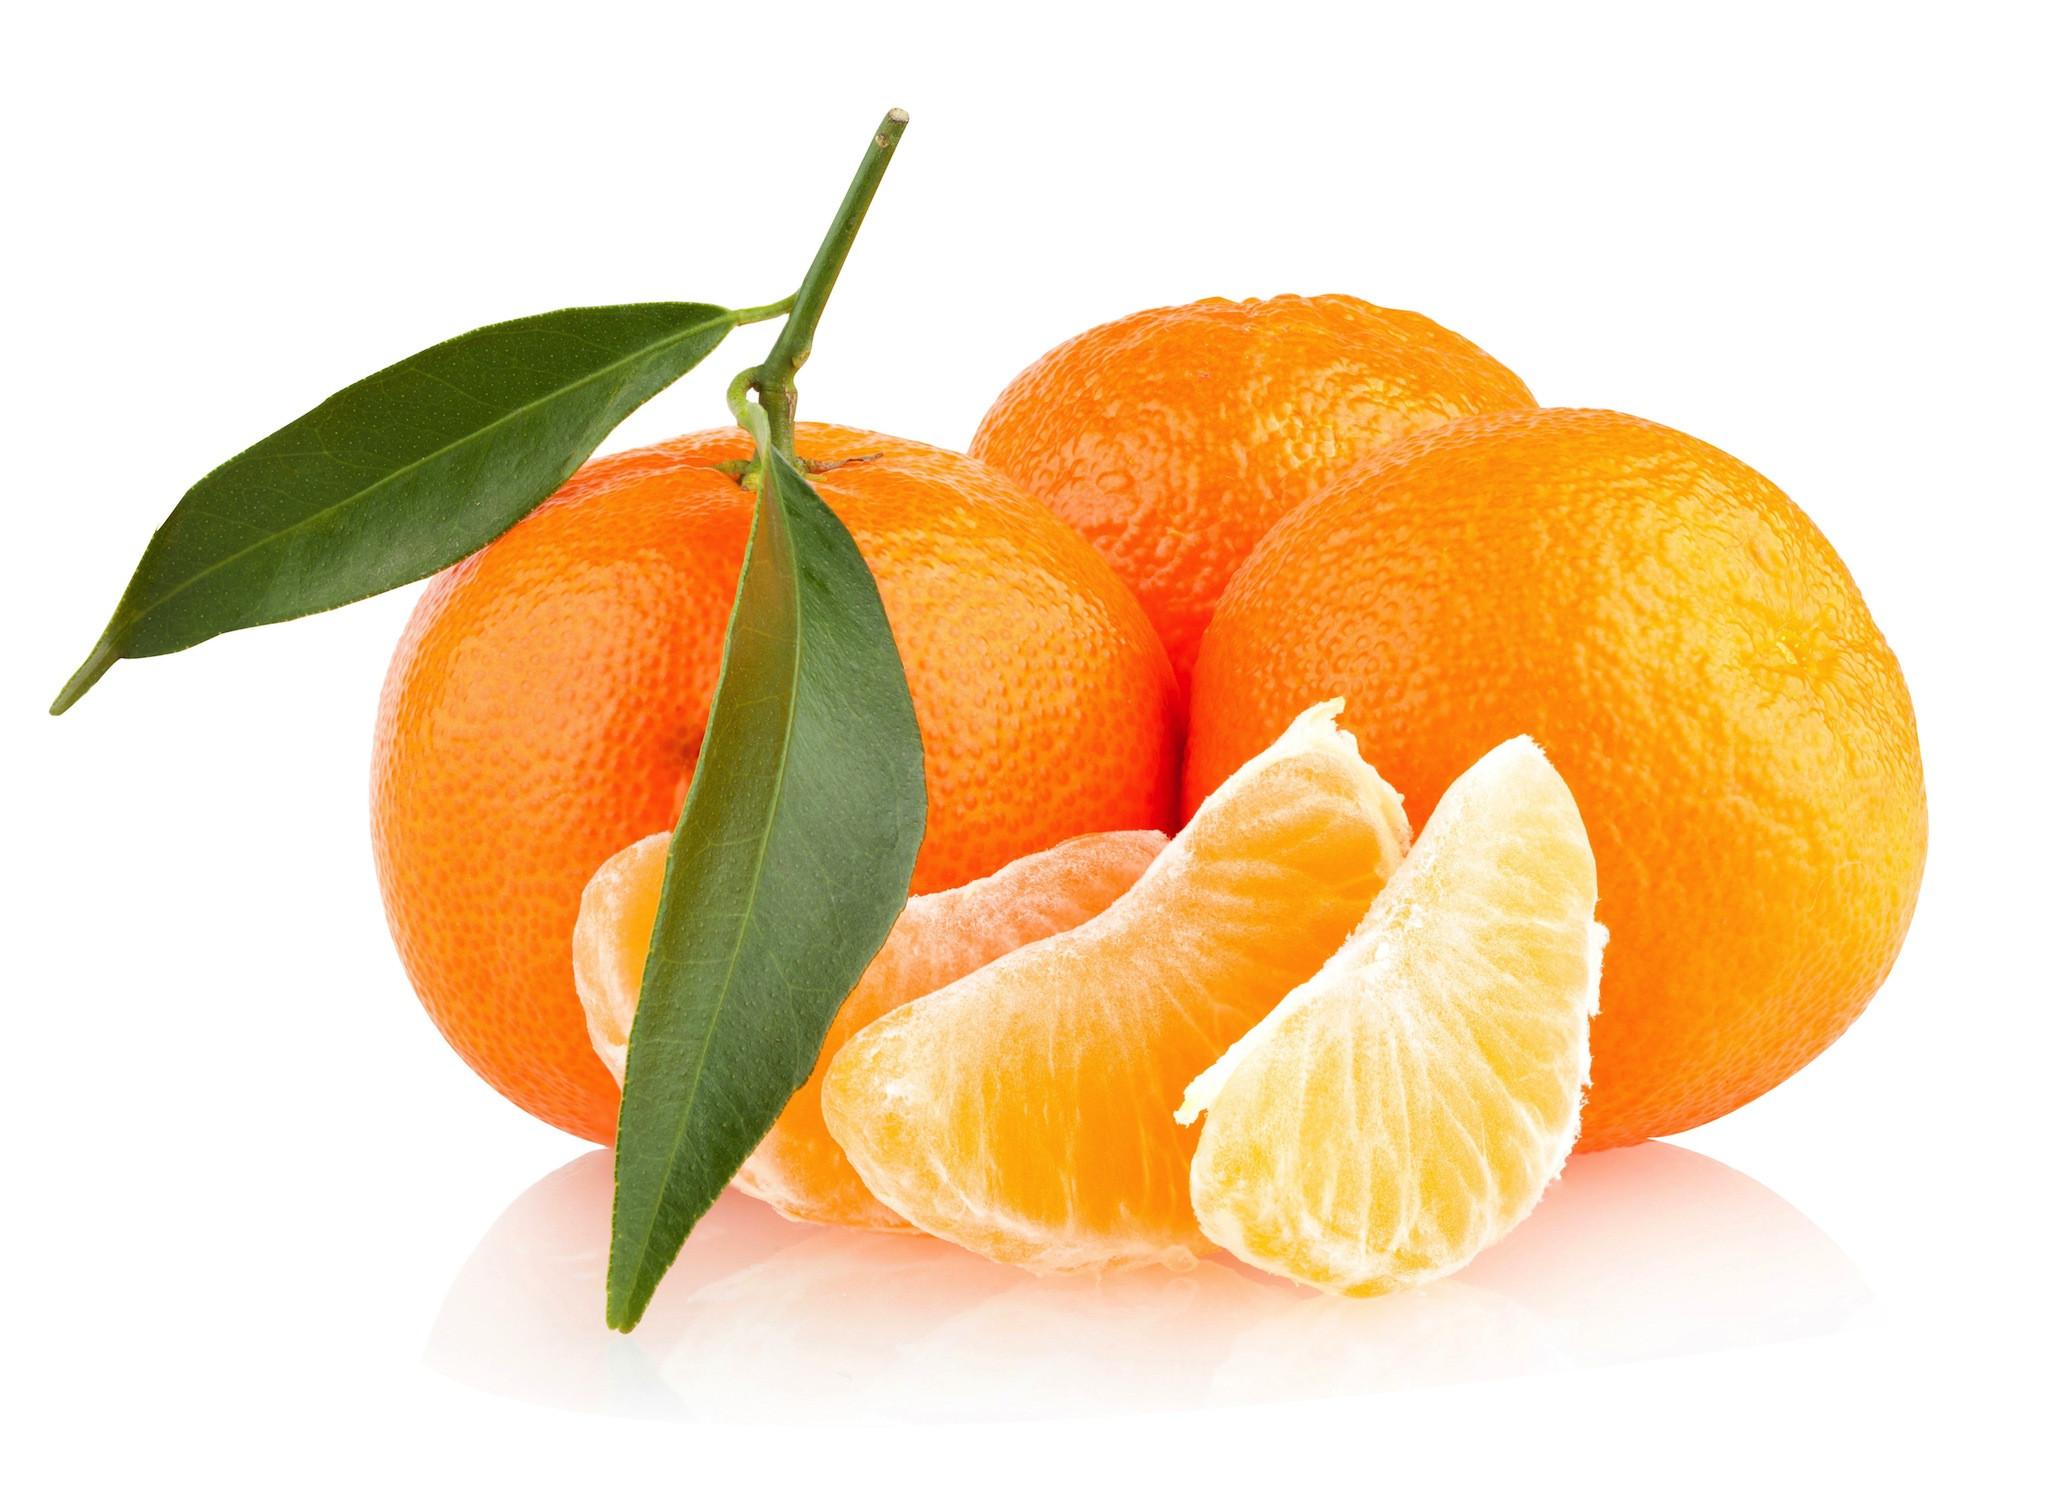 Mandarin Backgrounds on Wallpapers Vista